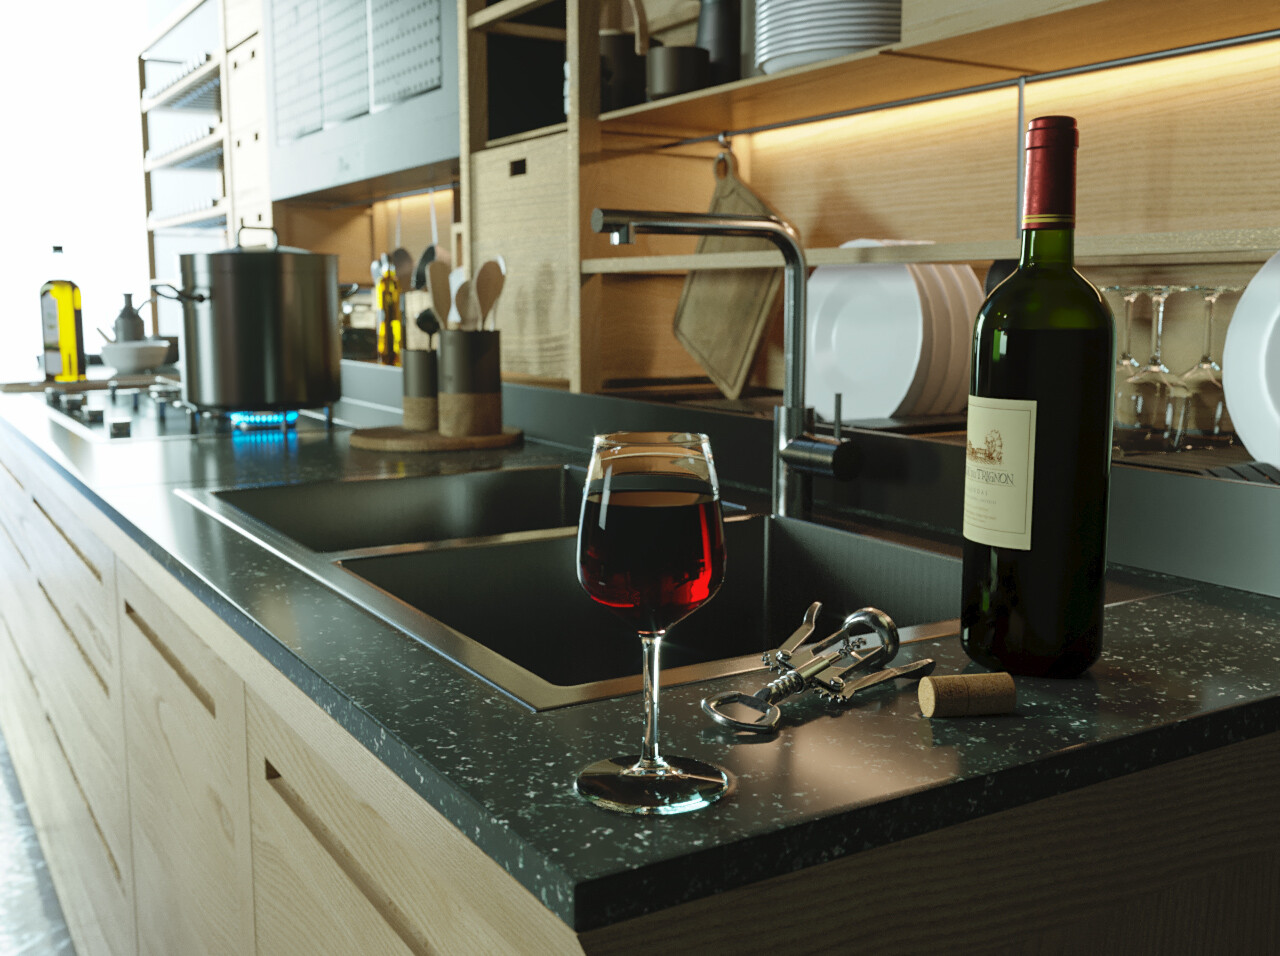 ArtStation - Valcucine kitchen, - photosynthèse 3D -